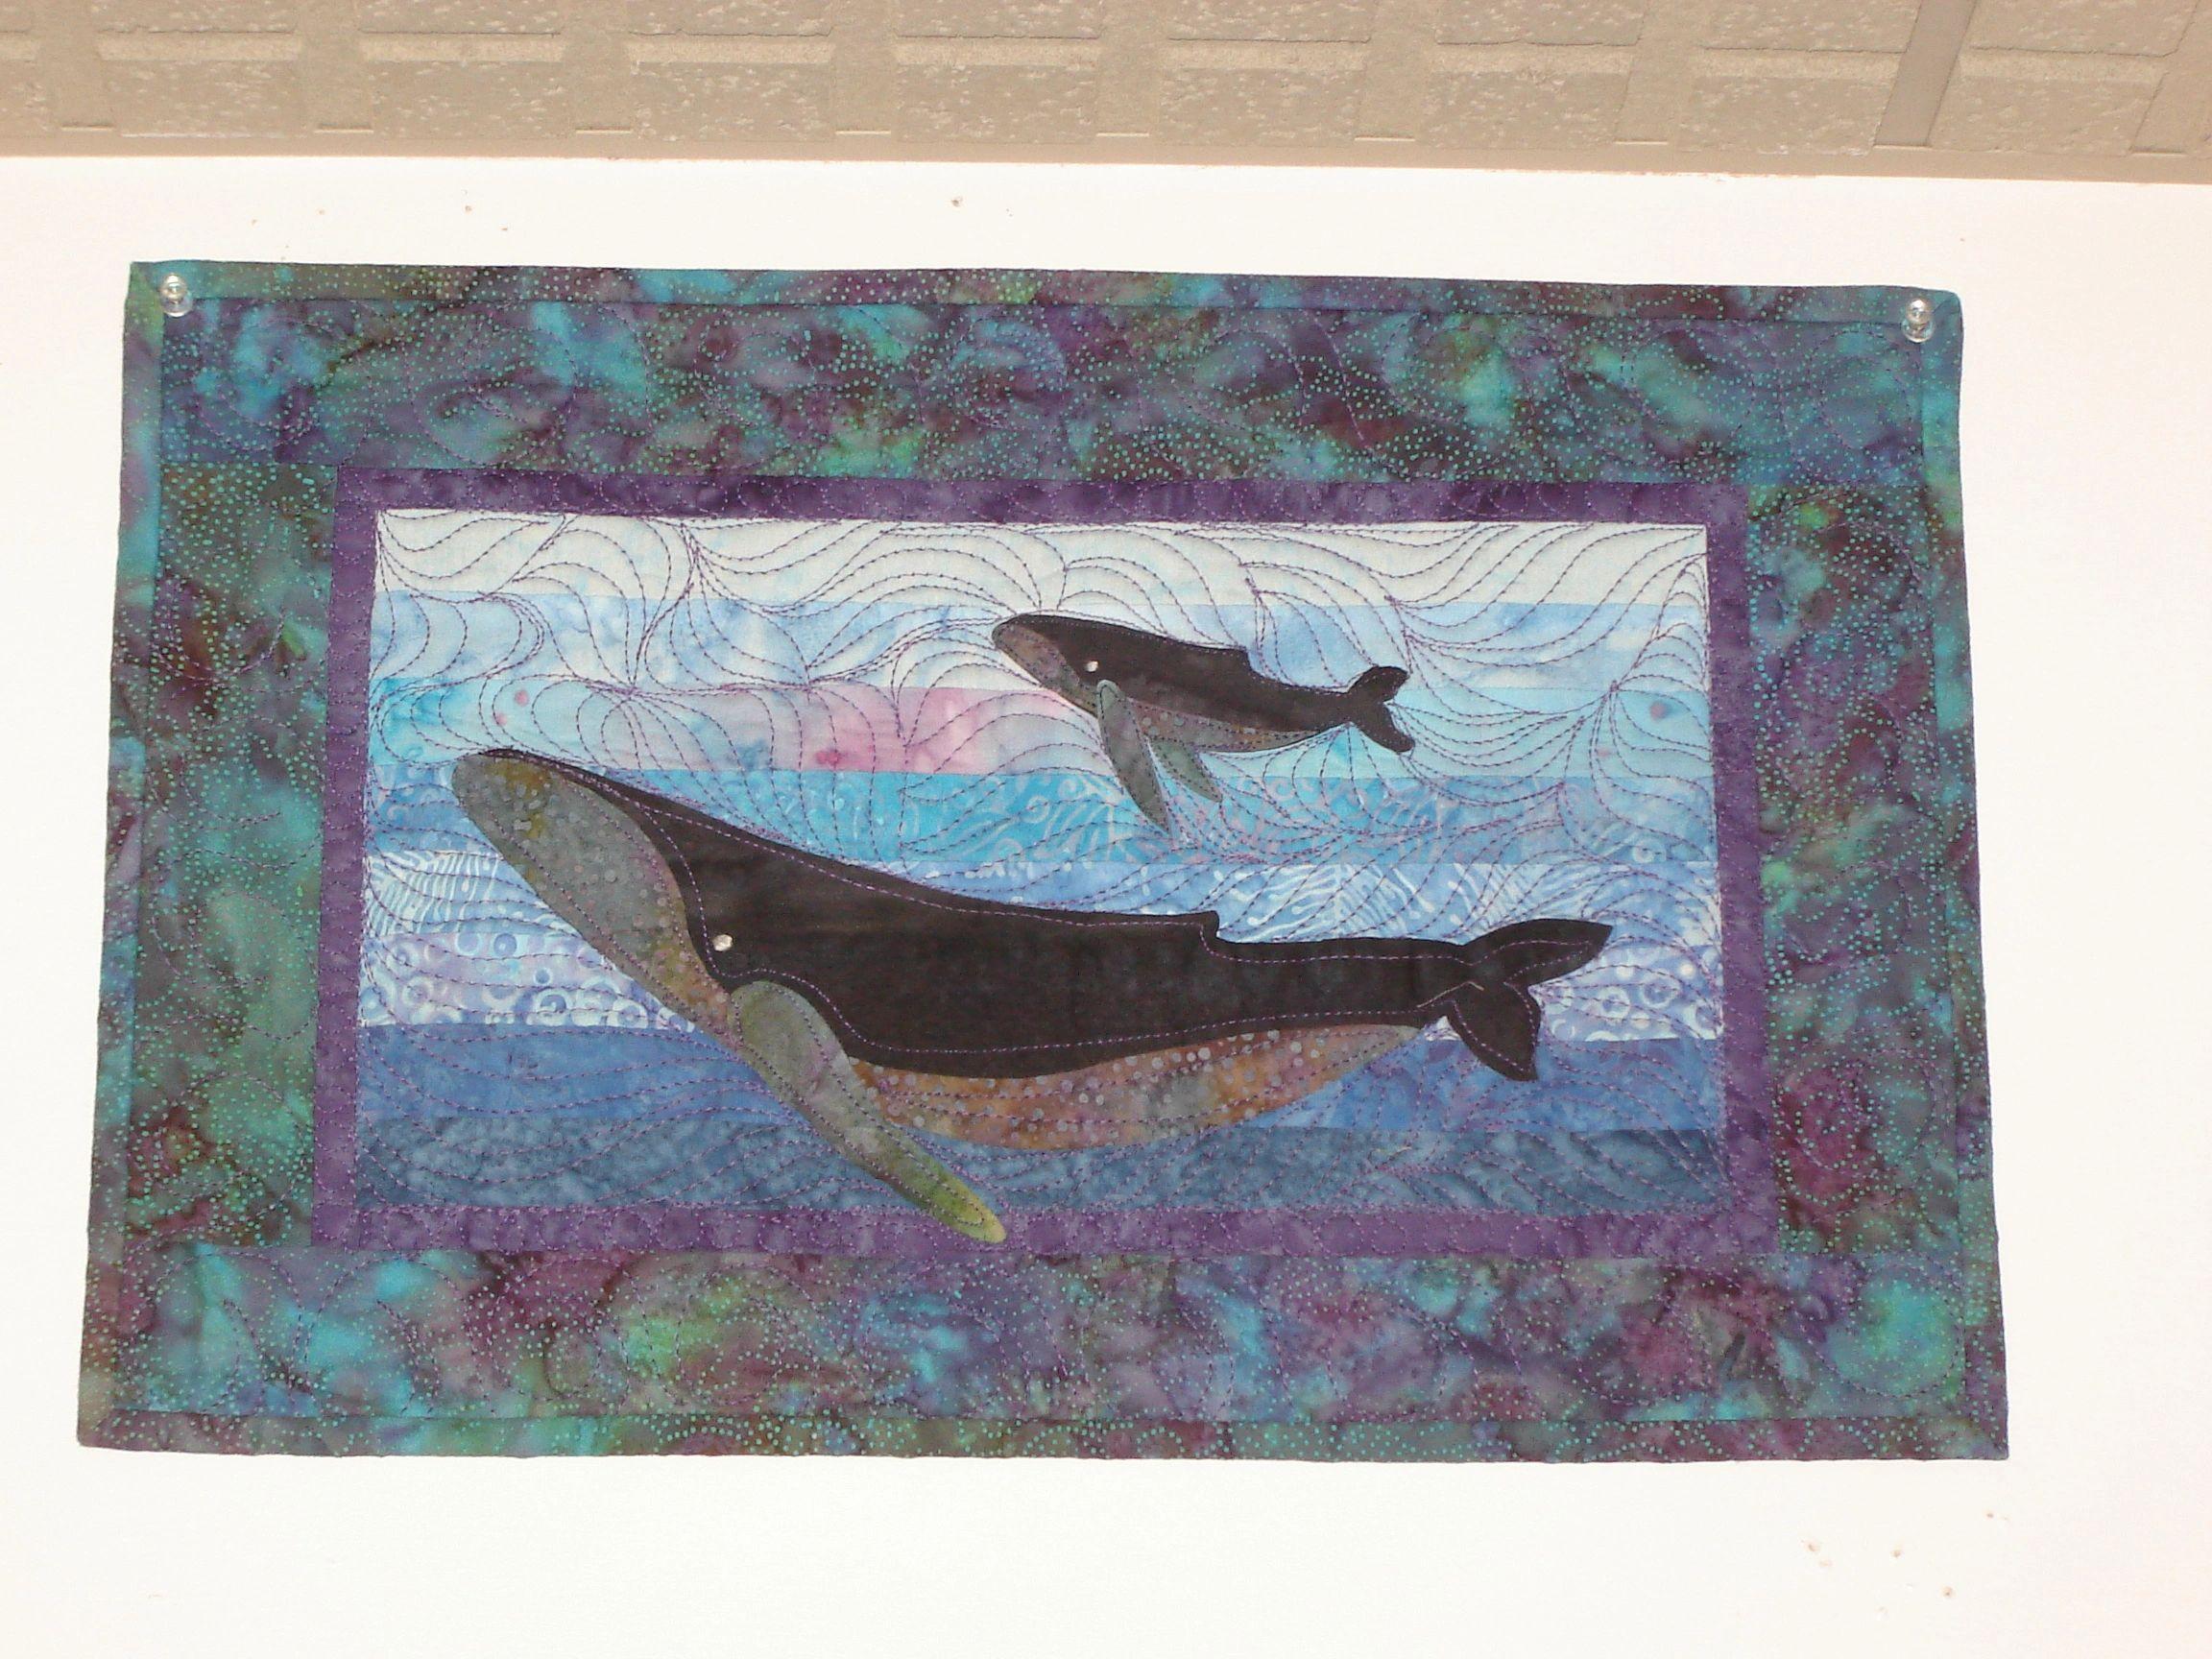 Humpback Whale Quilt Kit